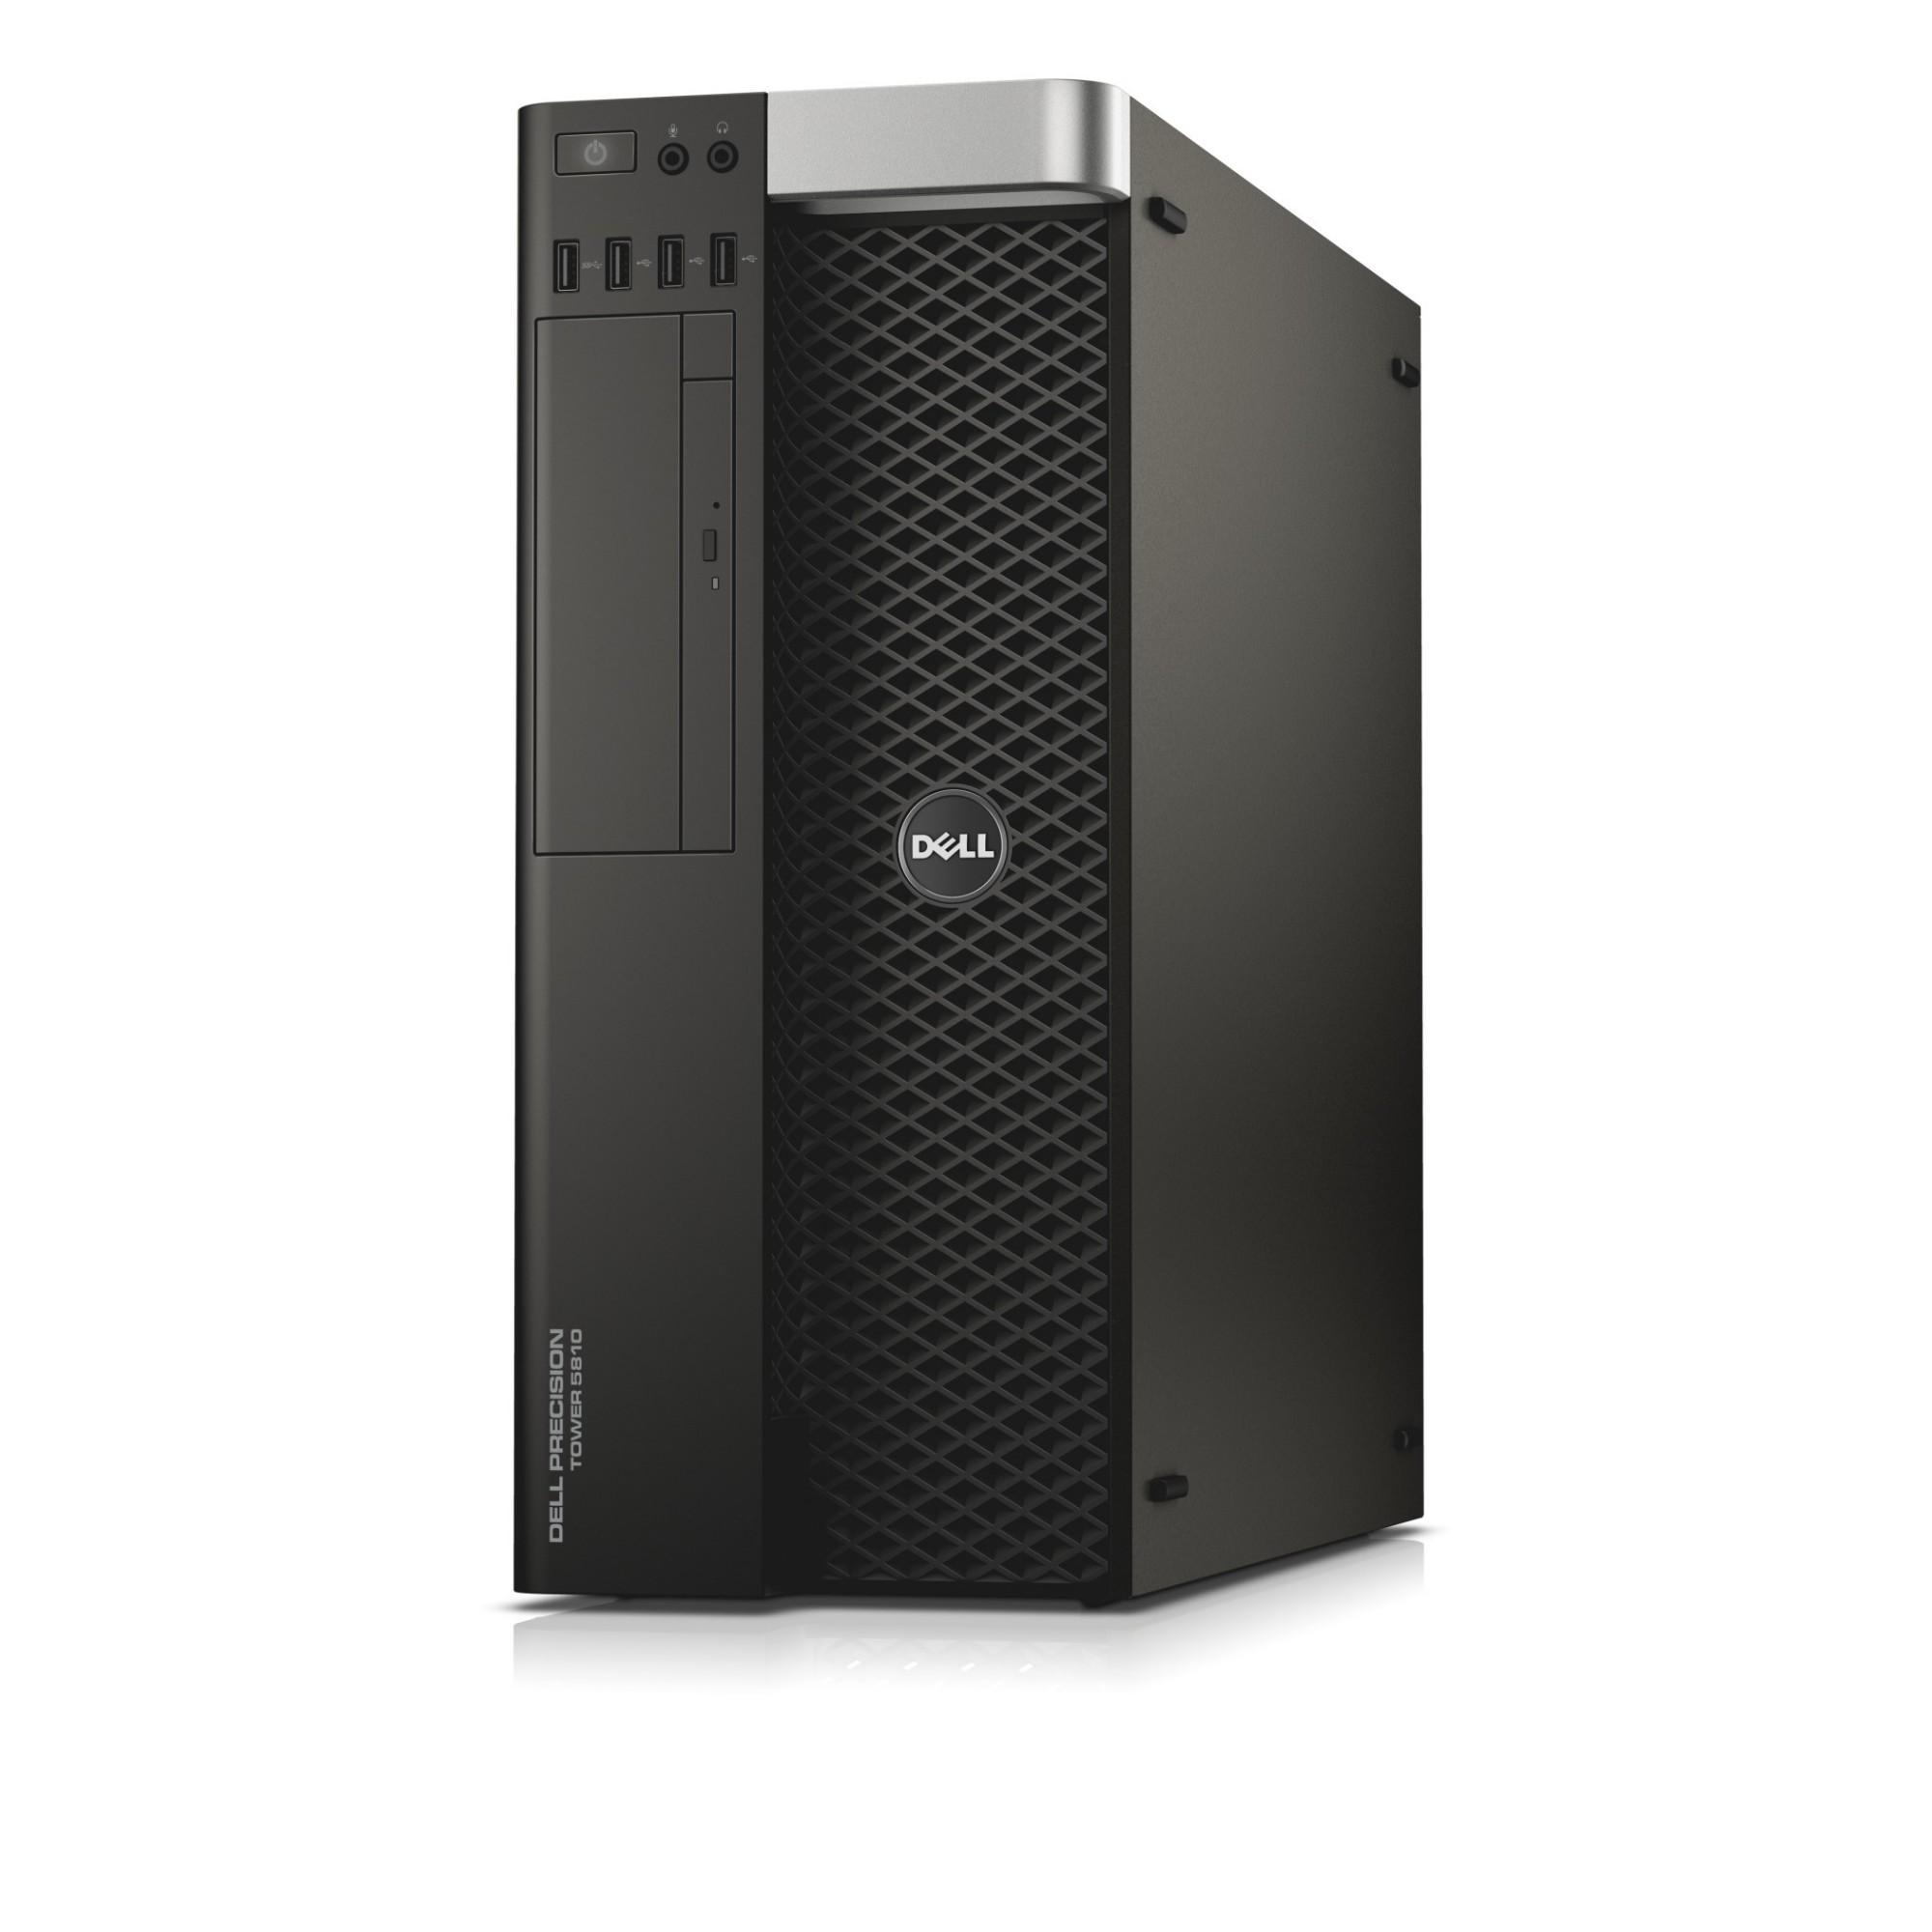 DELL Precision T5810 3.5GHz E5-1620V4 Tower Black Workstation